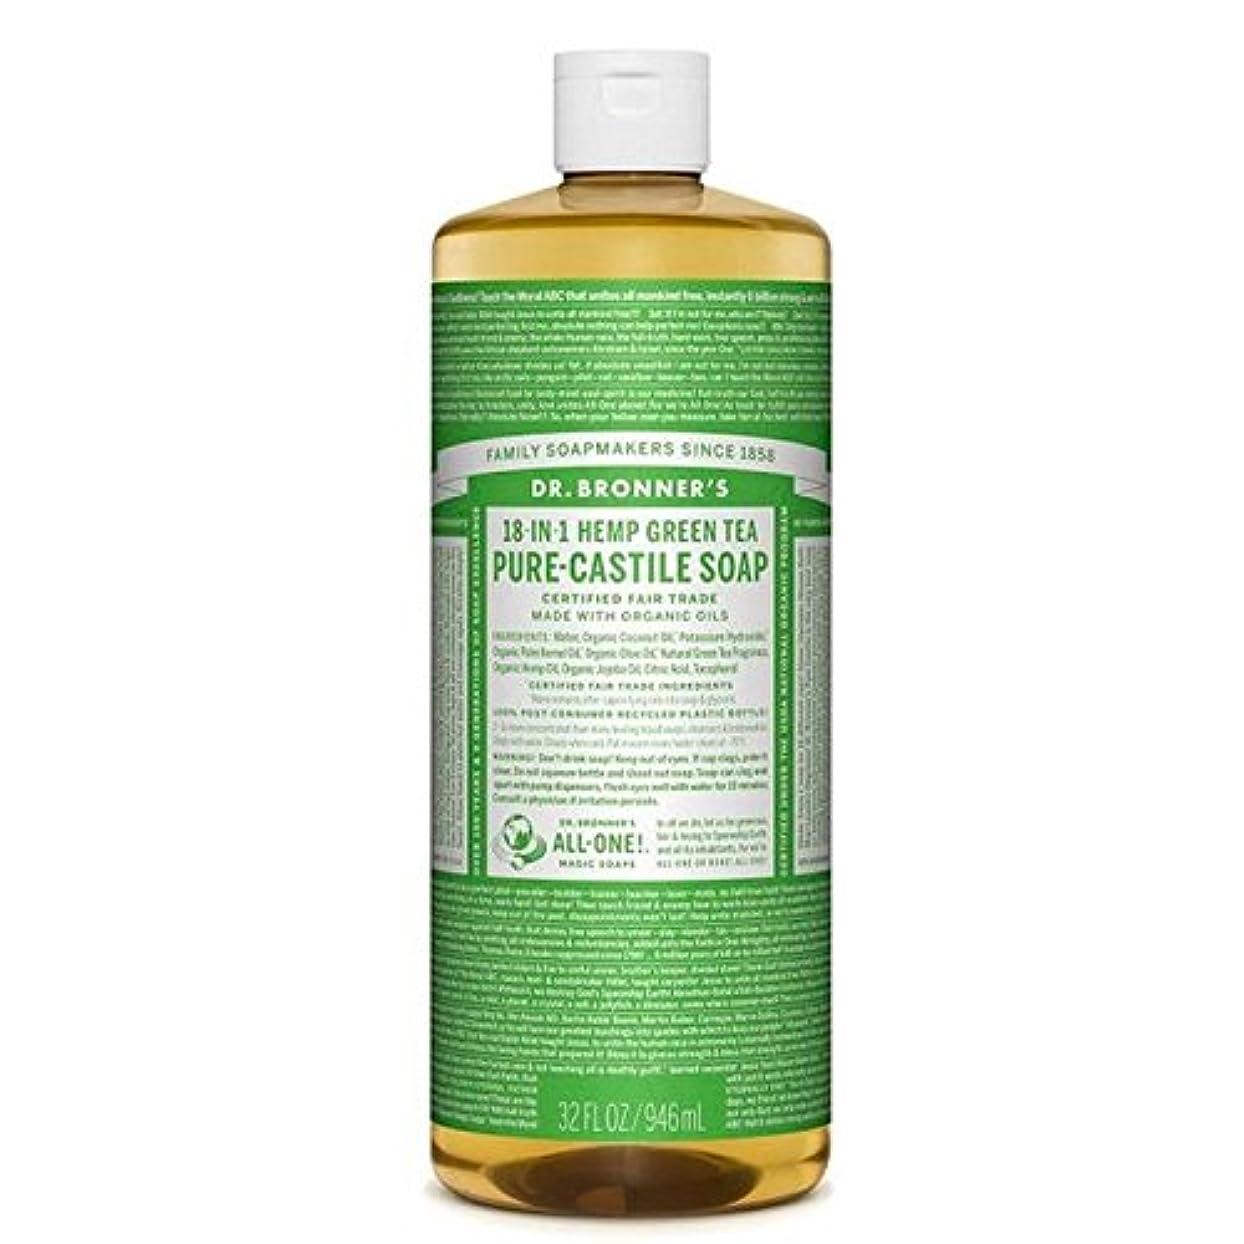 Dr Bronner Organic Green Tea Castile Liquid Soap 946ml (Pack of 6) - のブロナー有機緑茶カスティーリャ液体石鹸946ミリリットル x6 [並行輸入品]